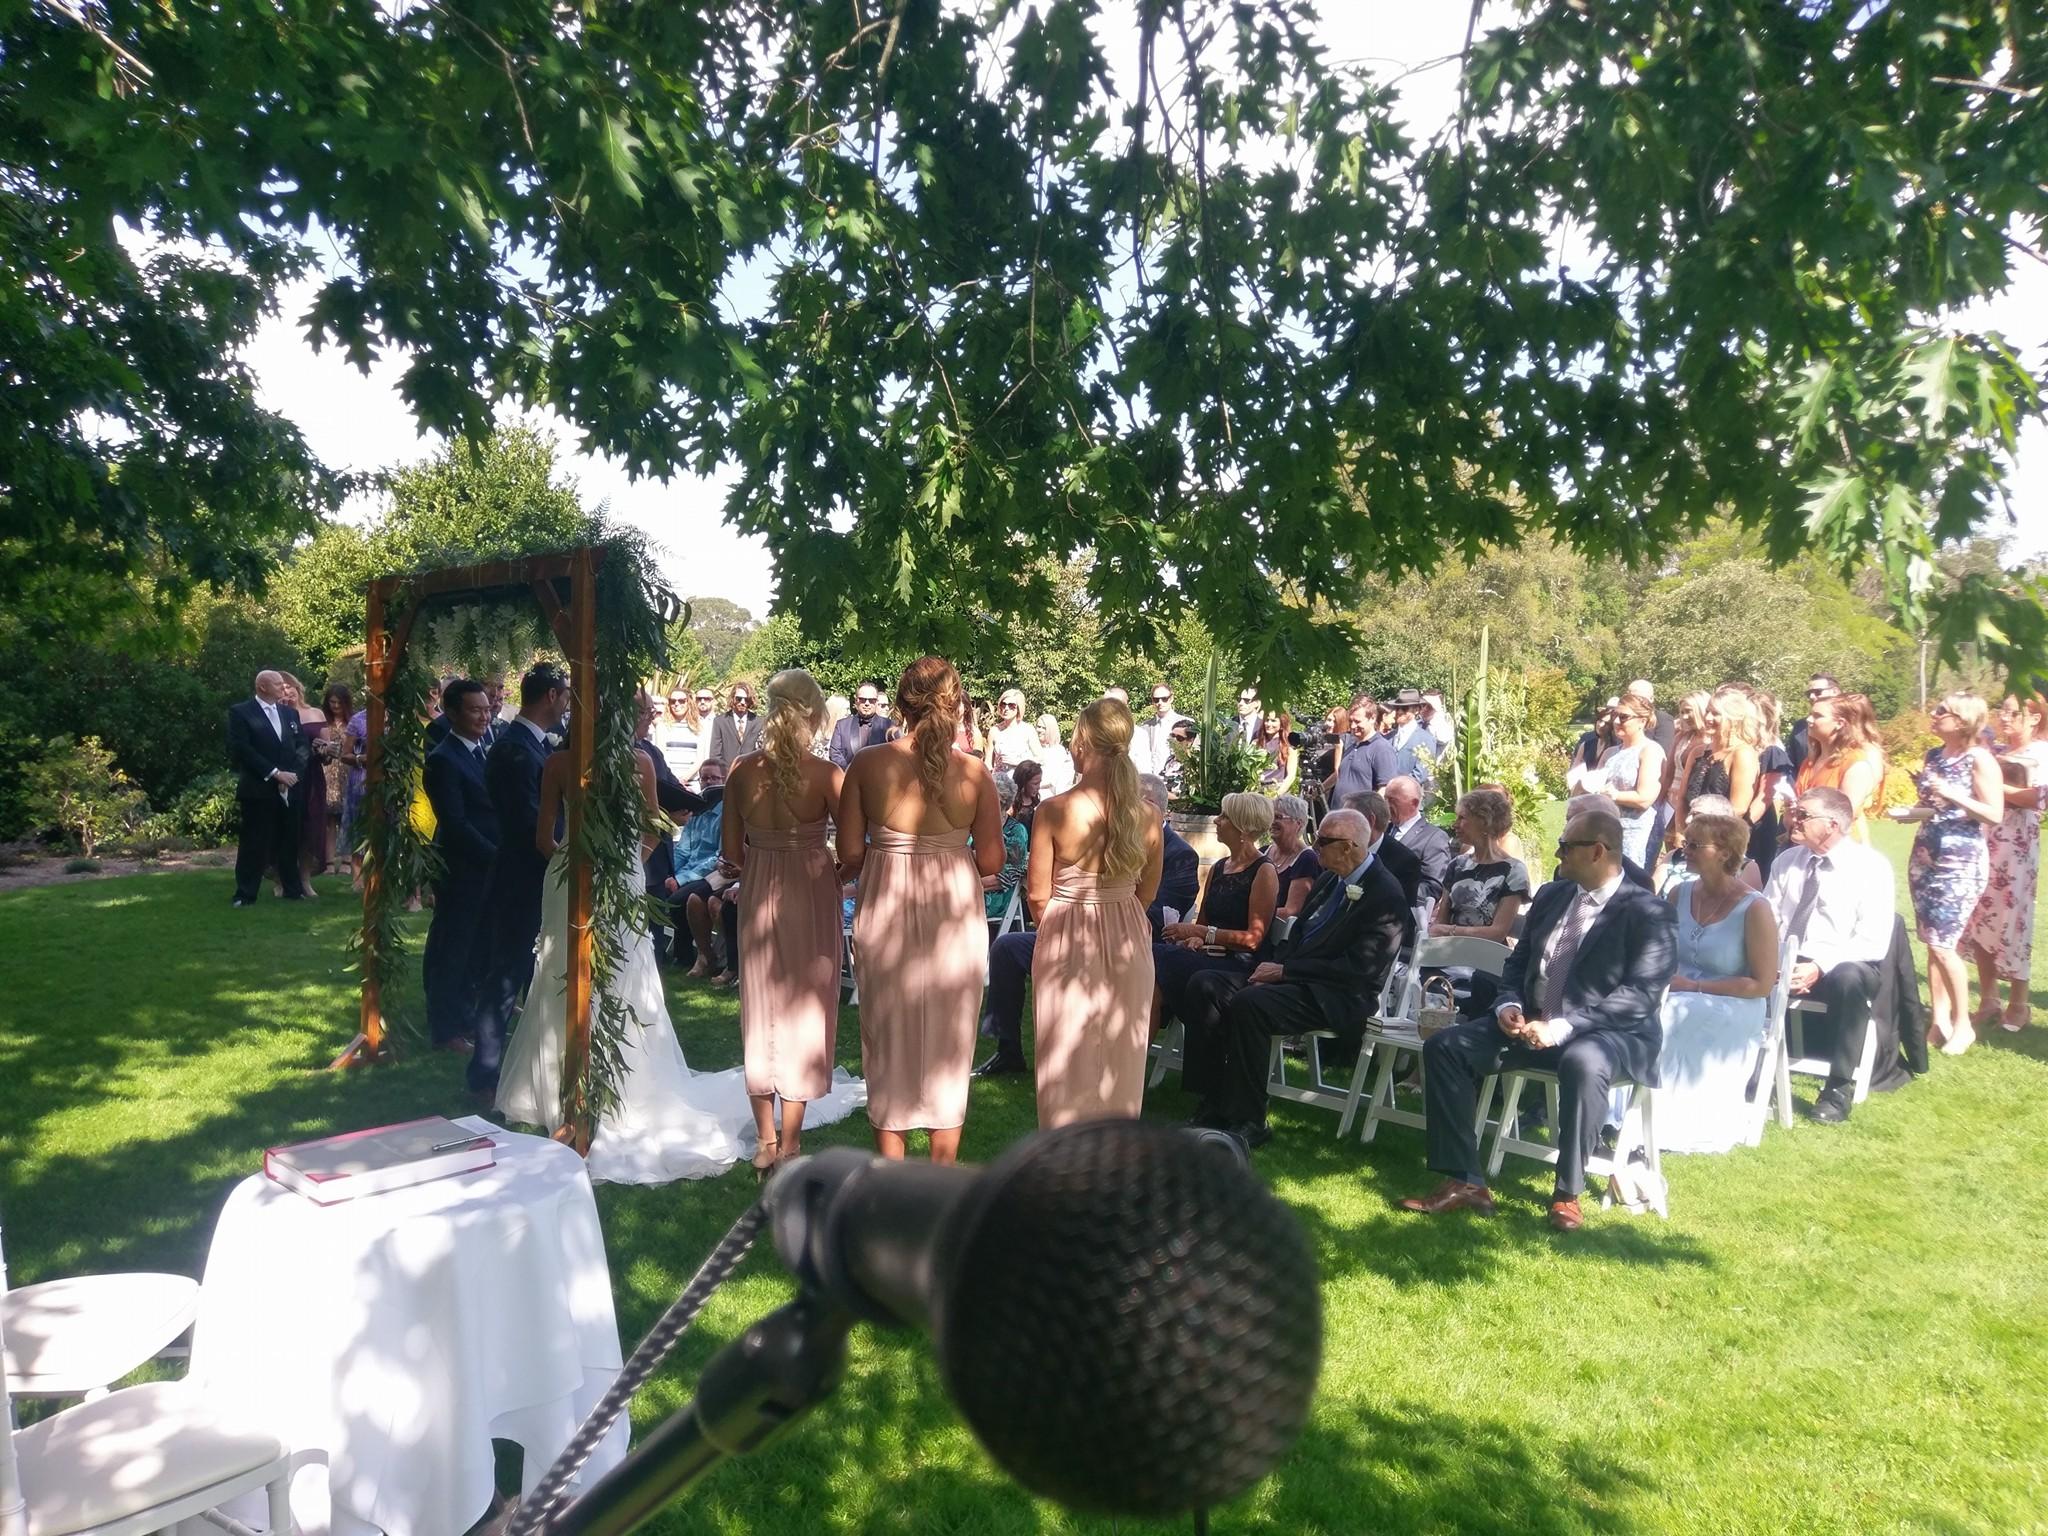 Craigieburn wedding ceremony